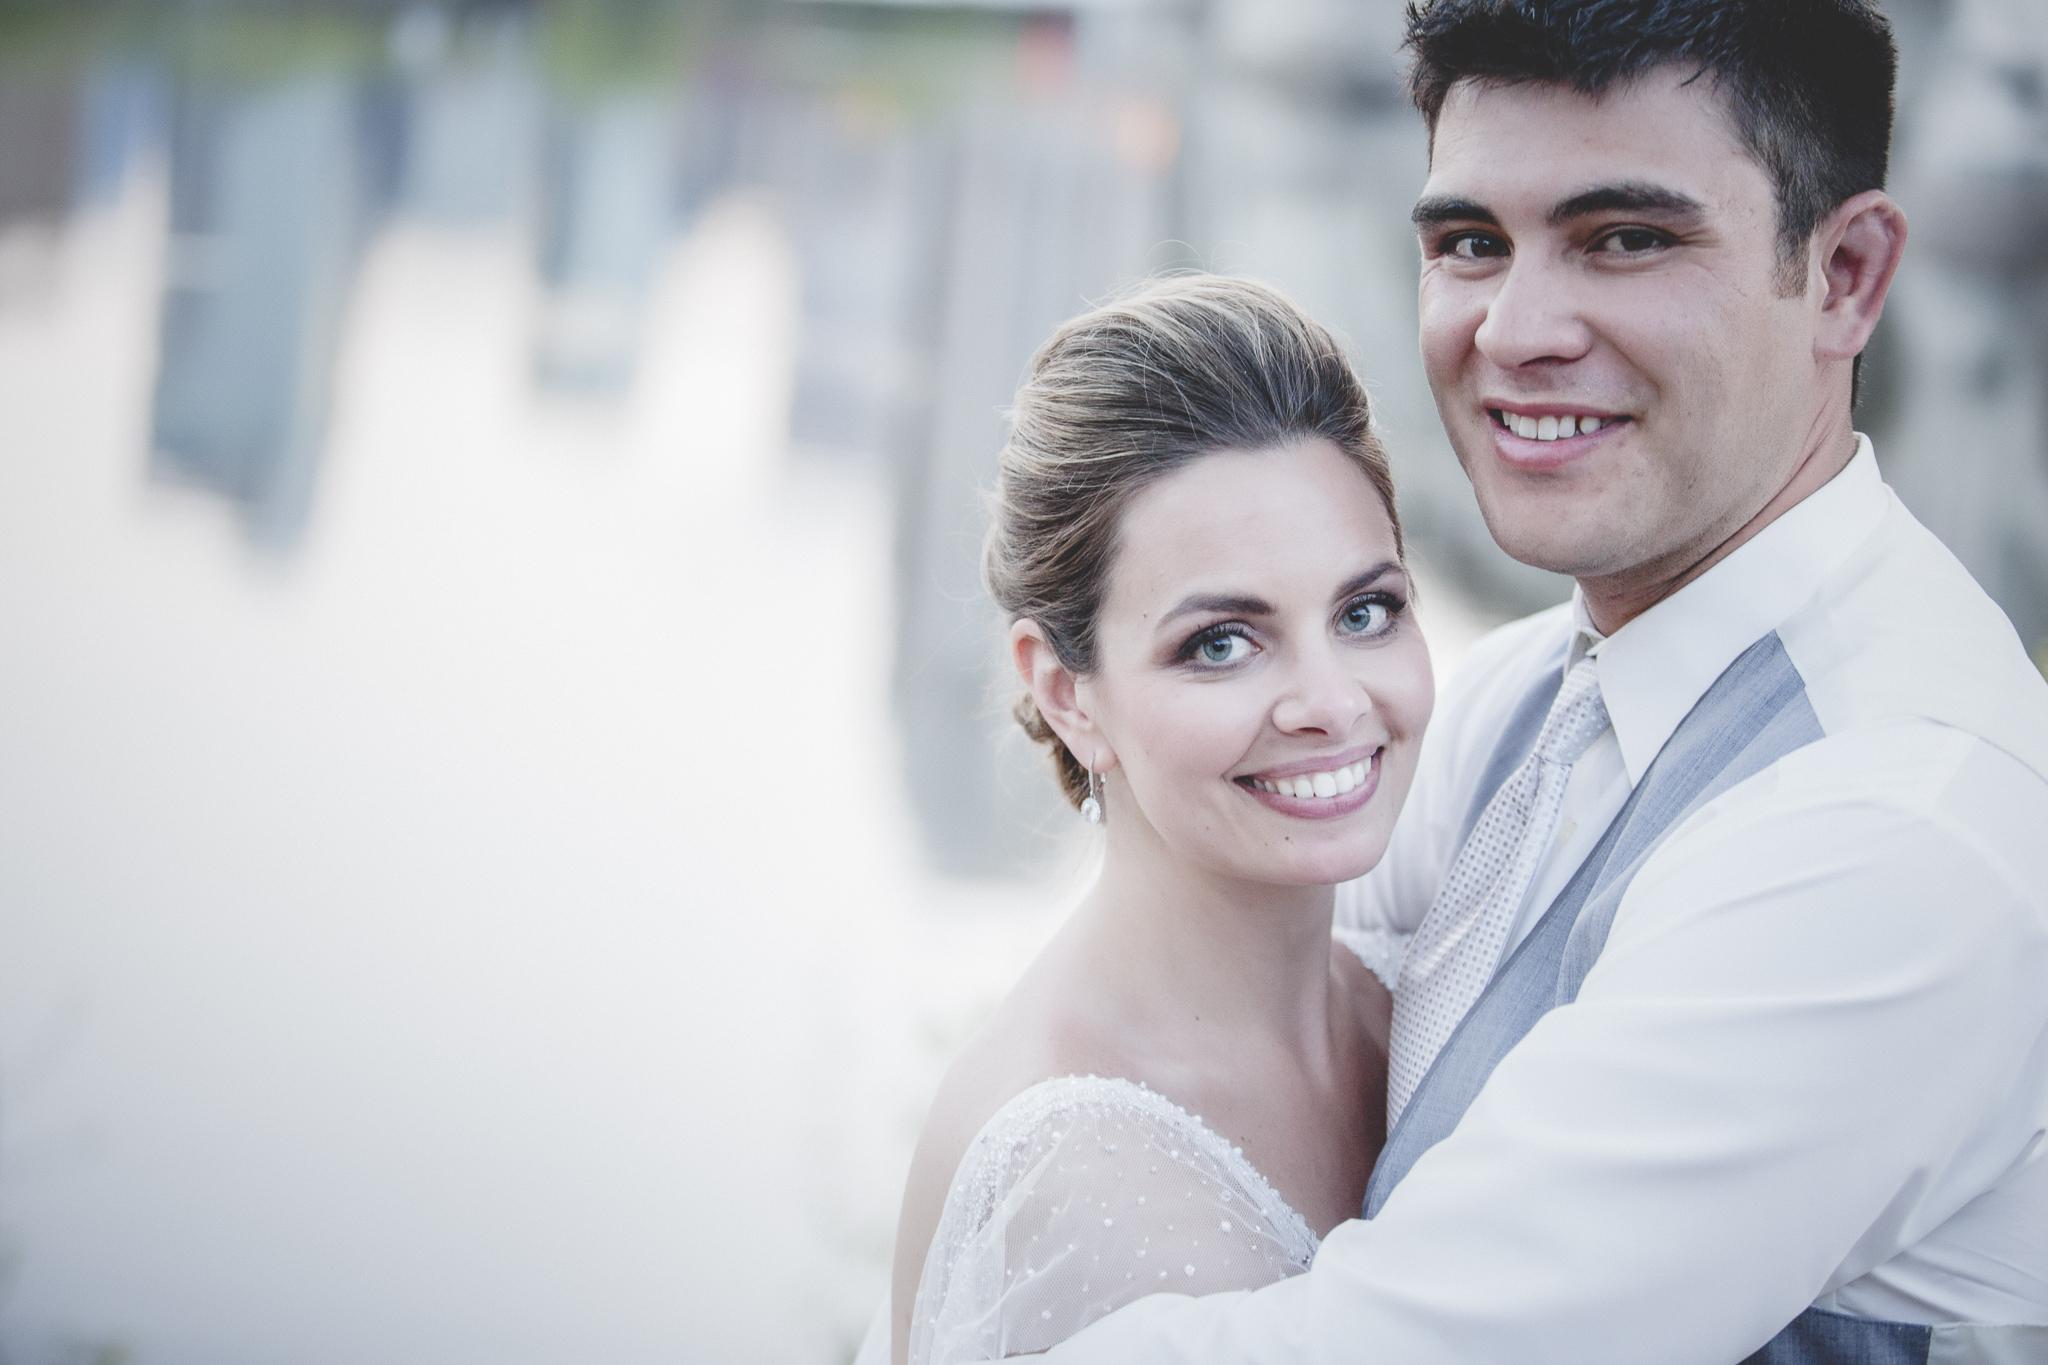 minneapolis event center wedding photographer-22.jpg